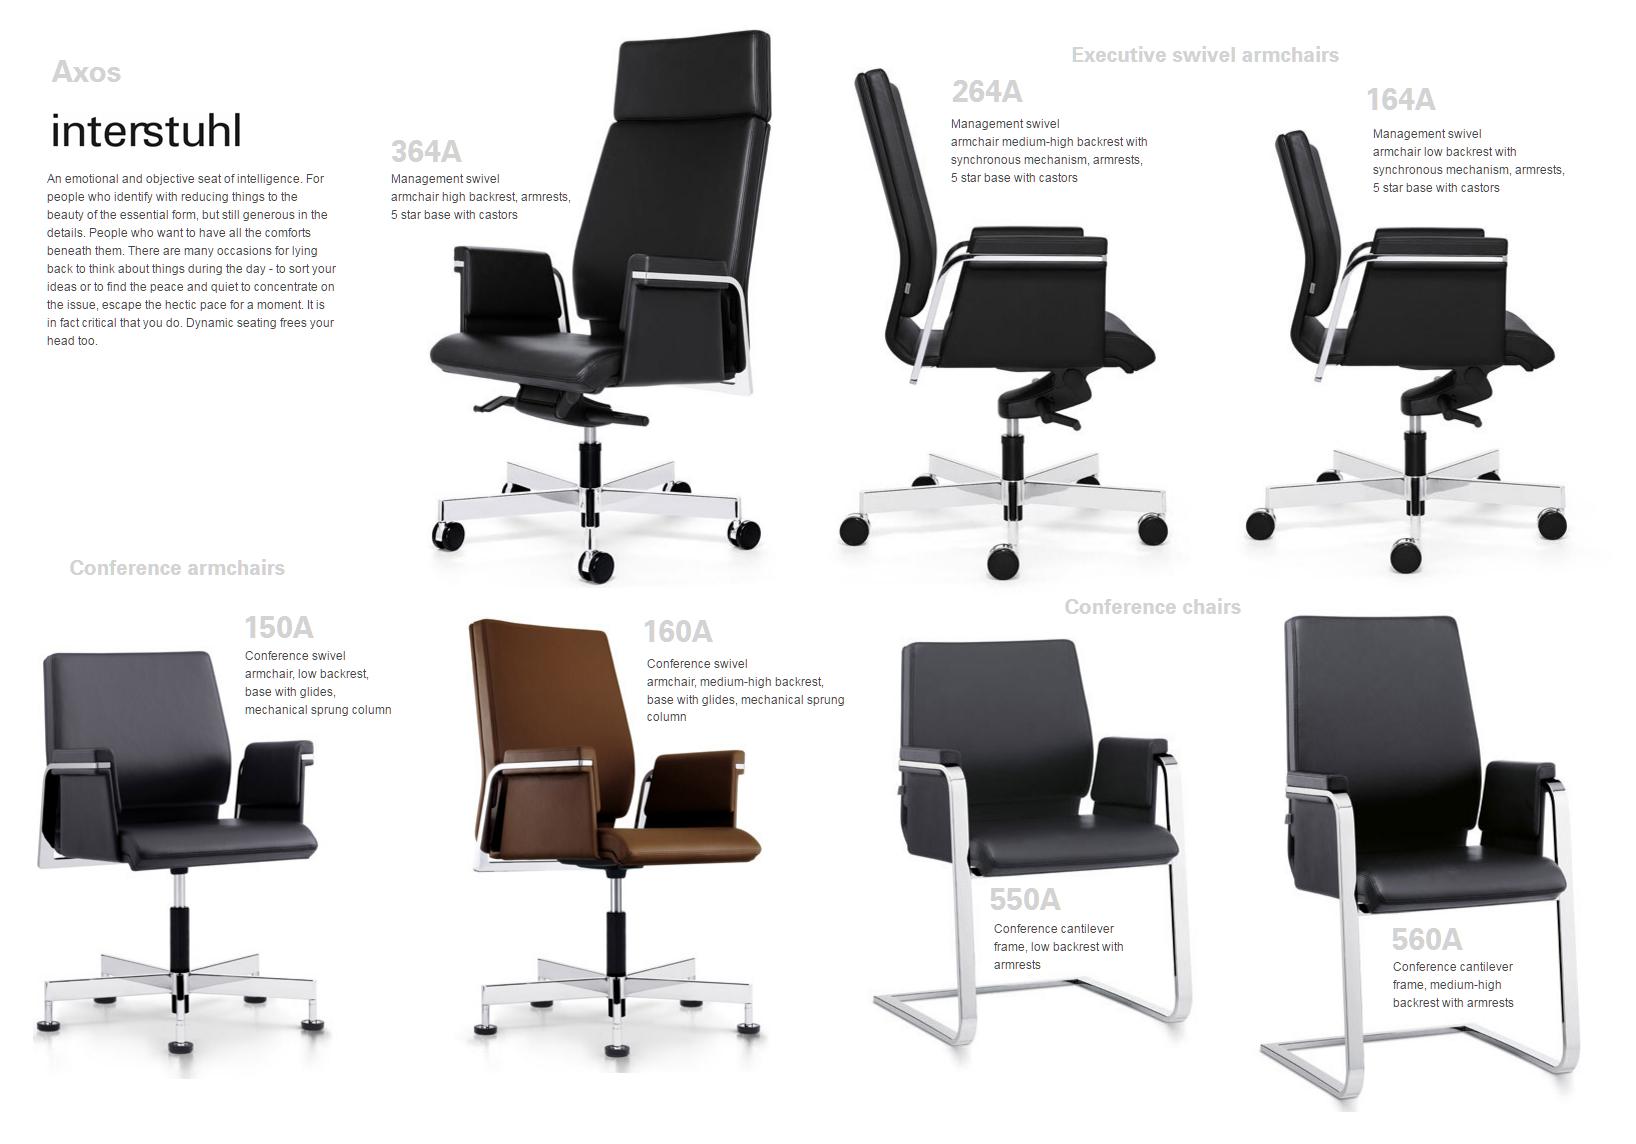 AXOS Chairs